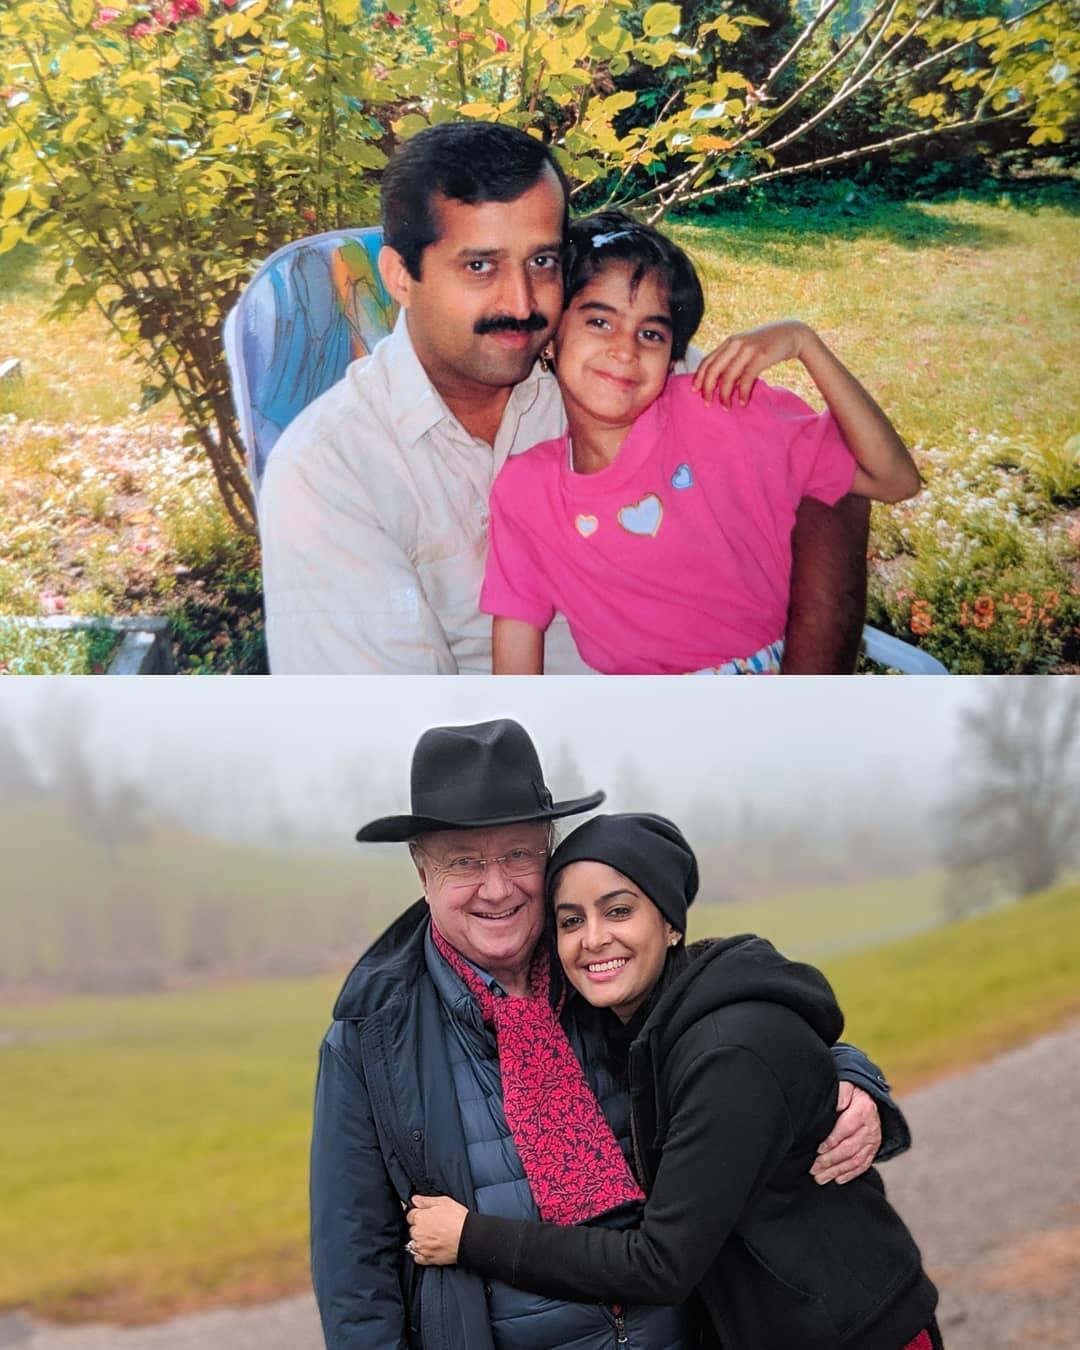 anisha-dutta-with-her-father-